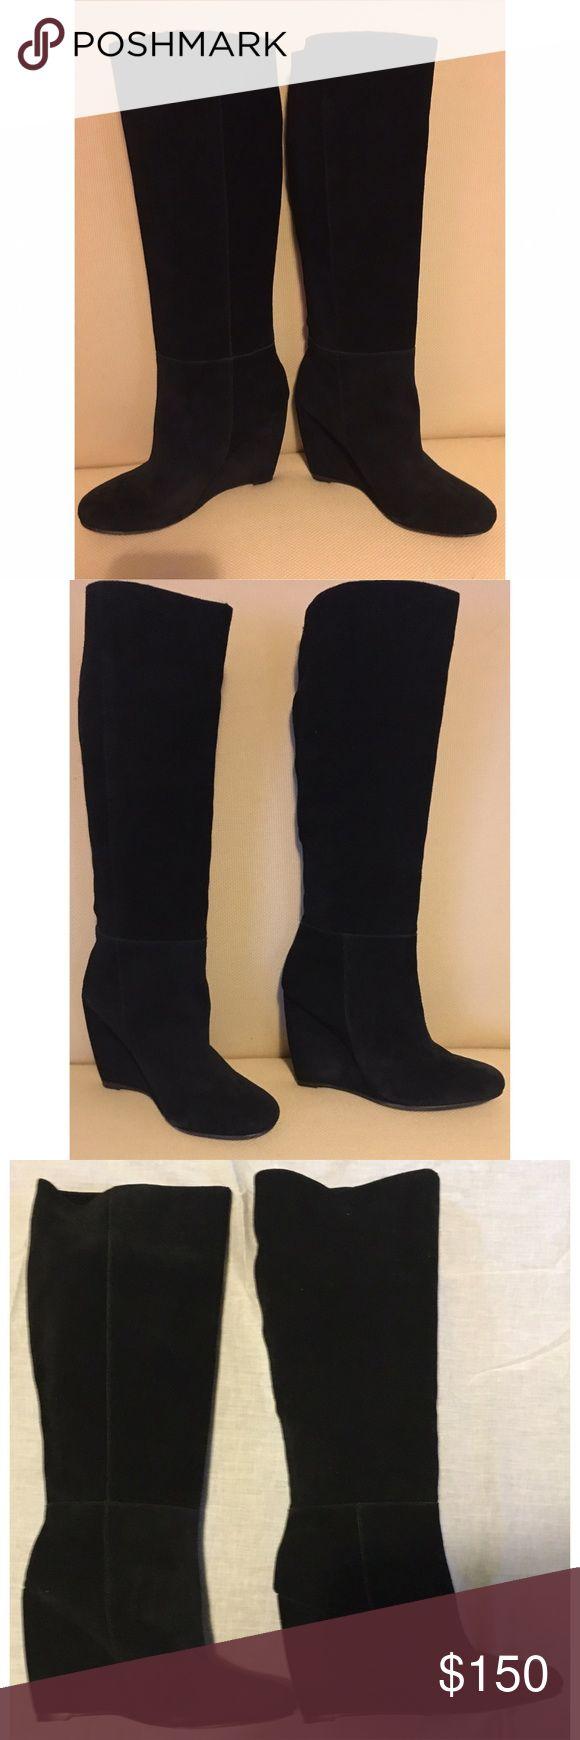 Josie black suede boots. New never worn. Joie black suede boots. Slide on soft suede. Size 36 1/2. Joie Shoes Heeled Boots